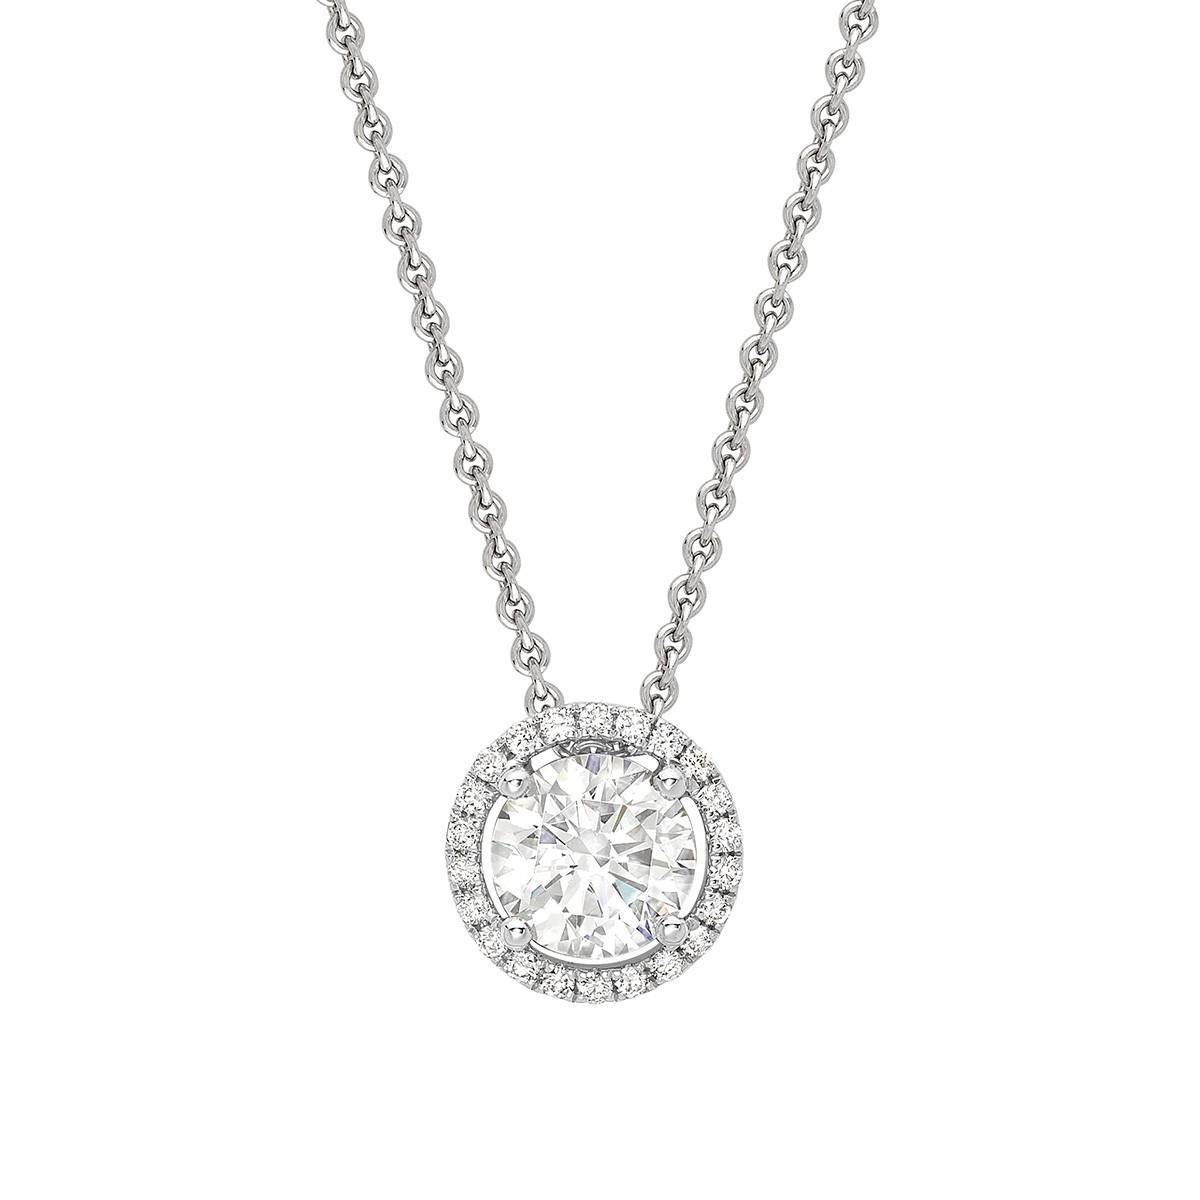 Round Halo Pendant - Riverton Diamonds in White Gold